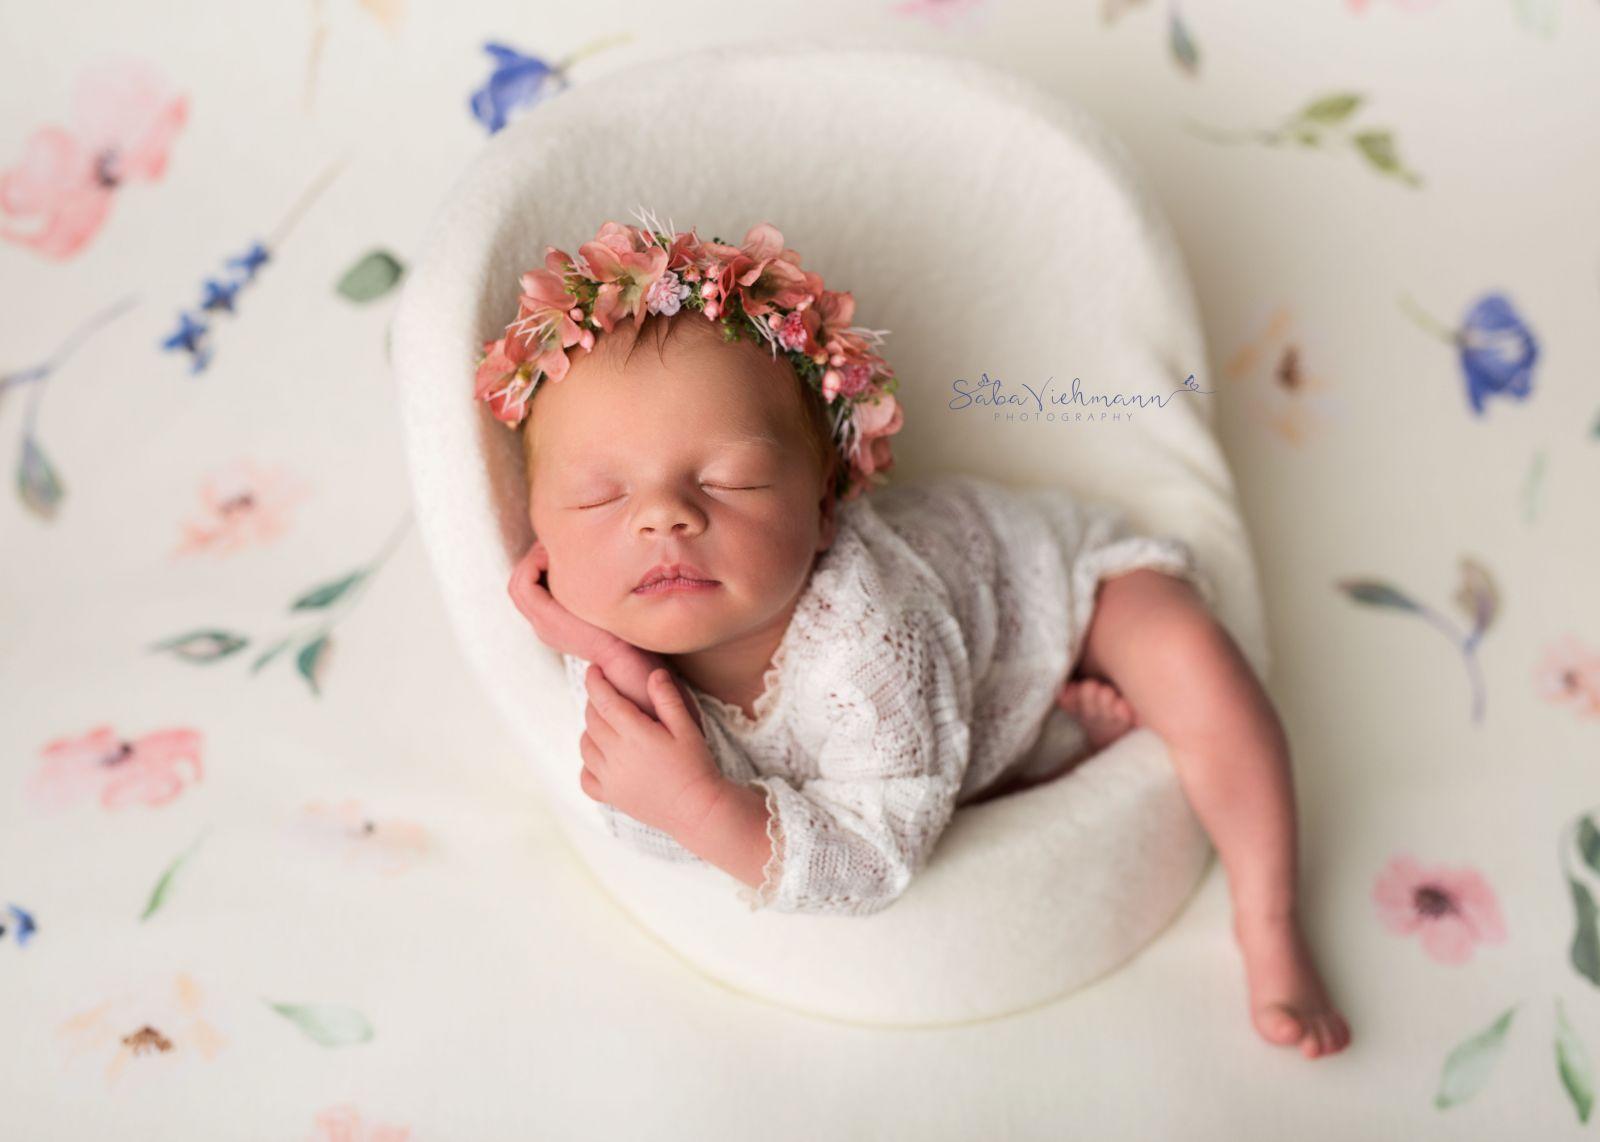 fotografie | fotostudio gießen | babyfotografie | babyfotograf | babyfotostudio | babyfotos | neugeborenenfotos | schwangerschaftsfotos